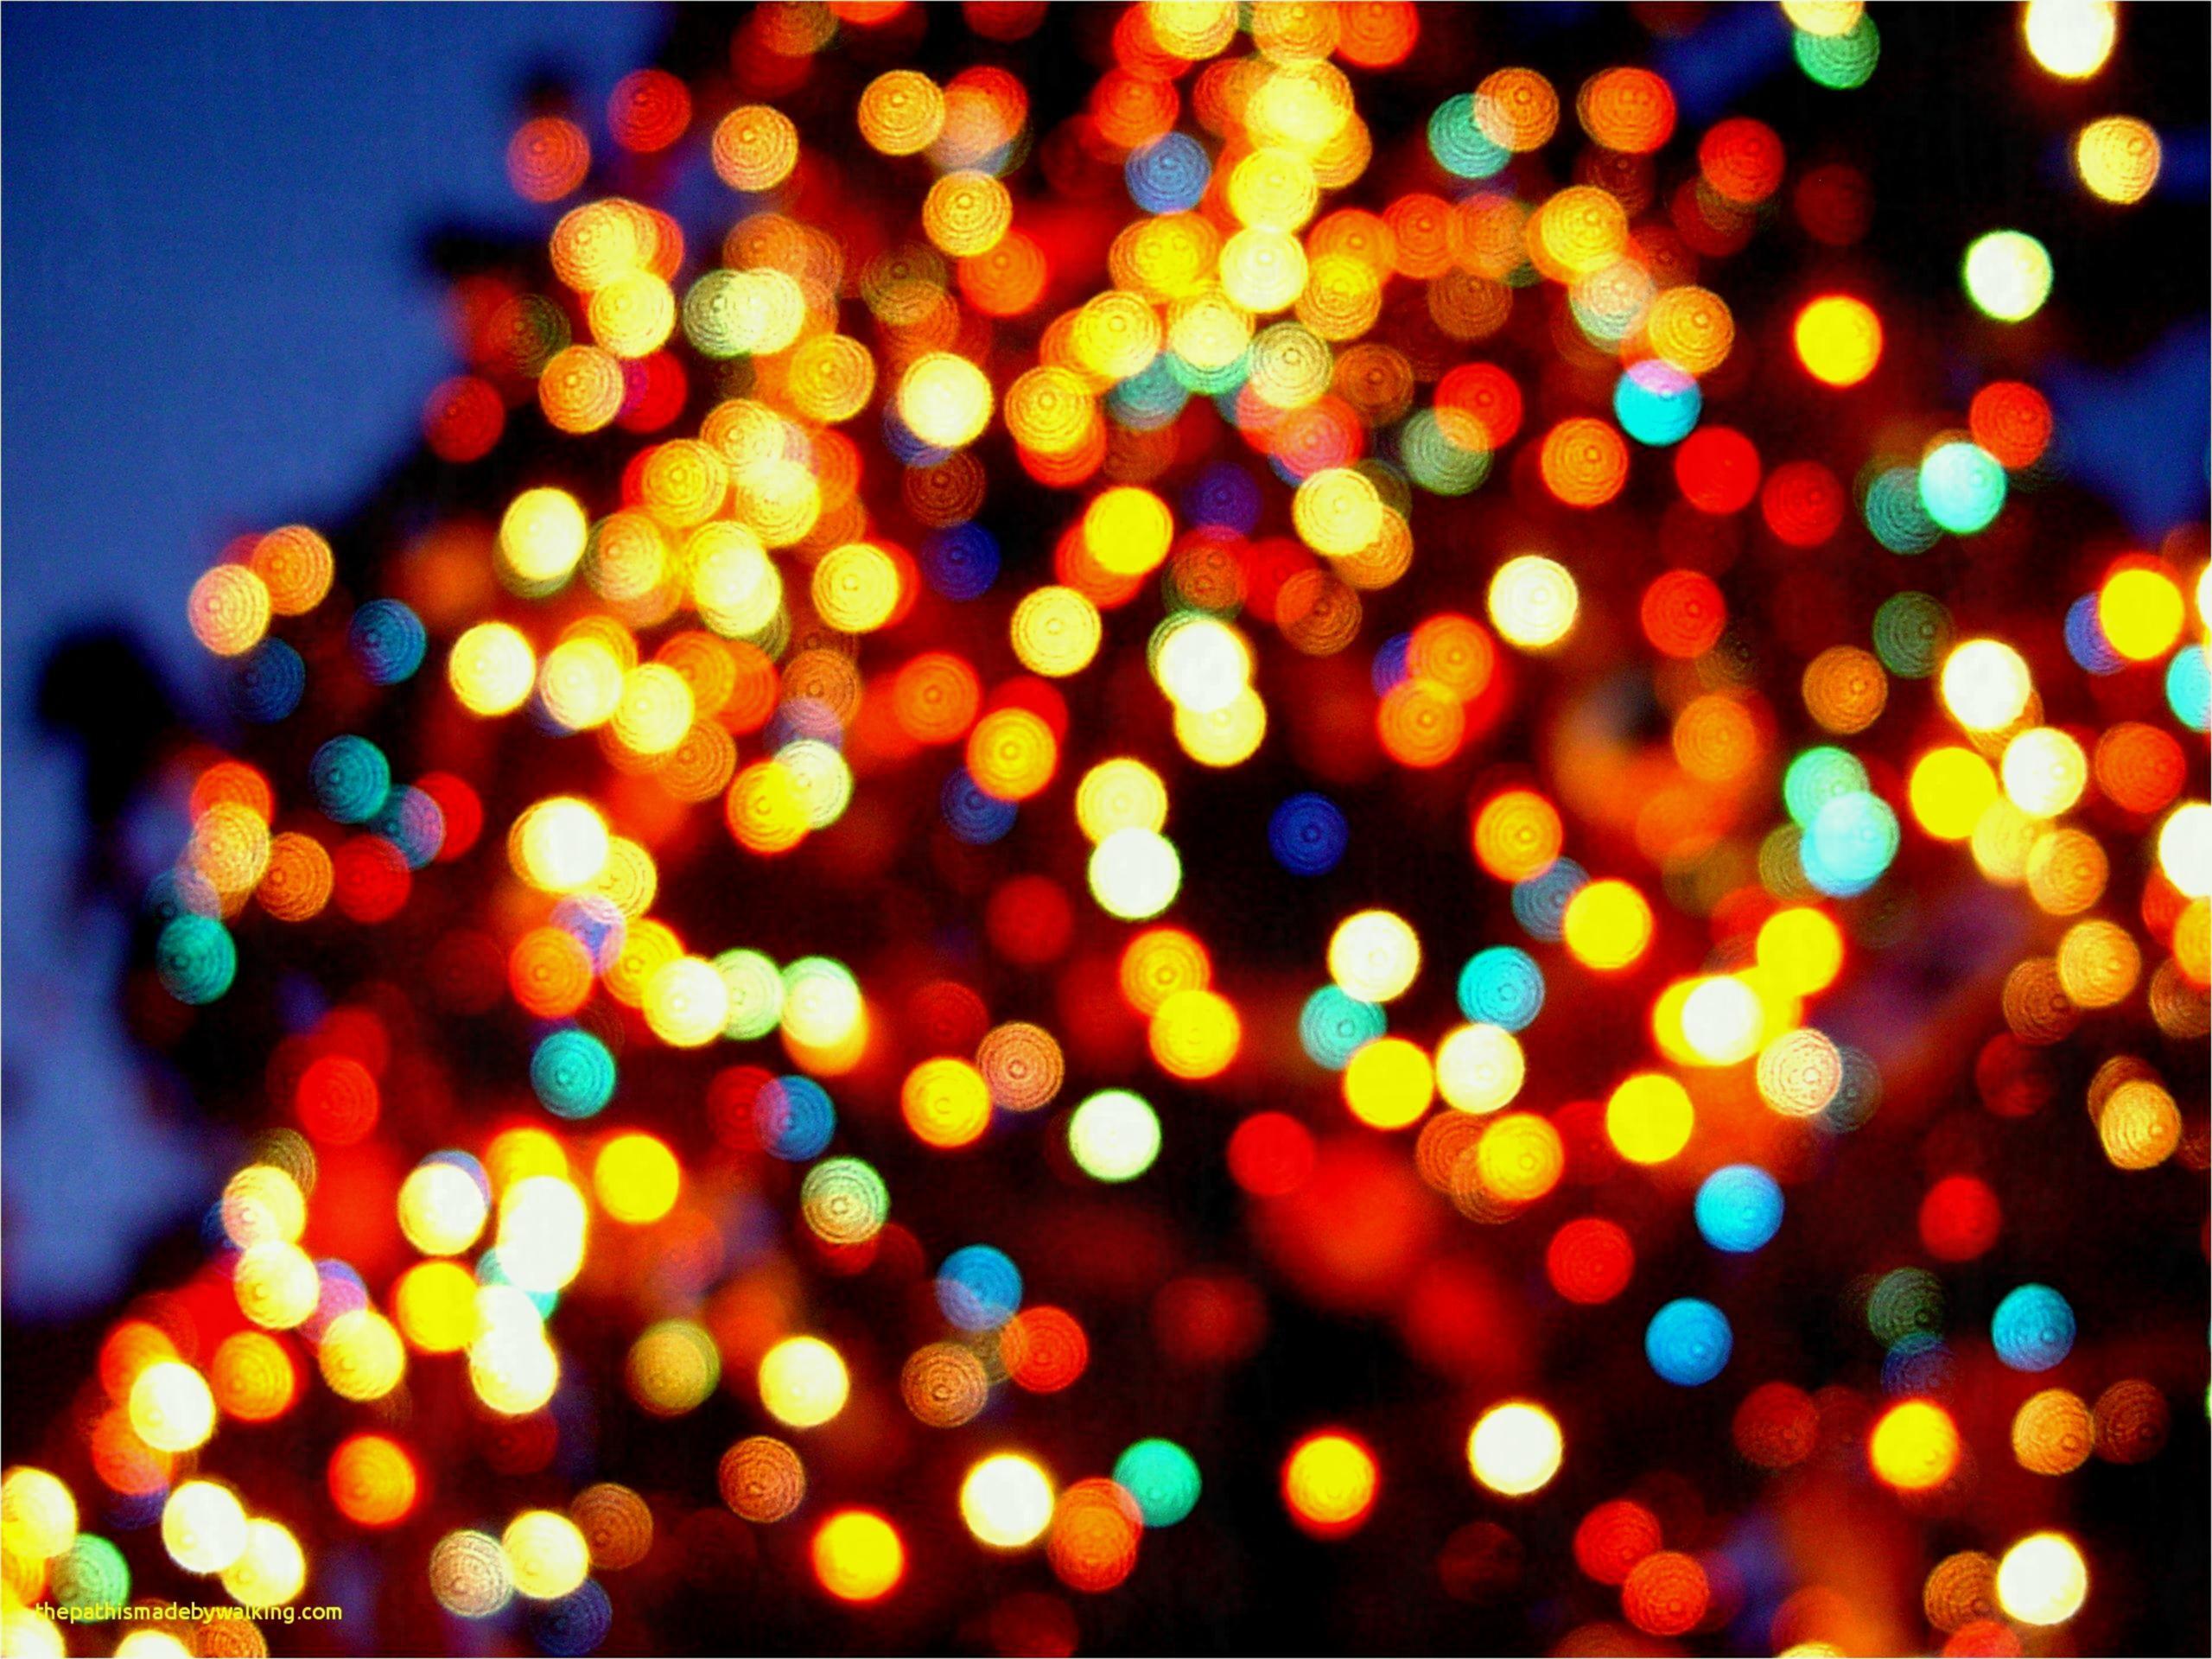 Lovely Fairy Lights Background Tumblr Christmas   Christmas 2560x1920